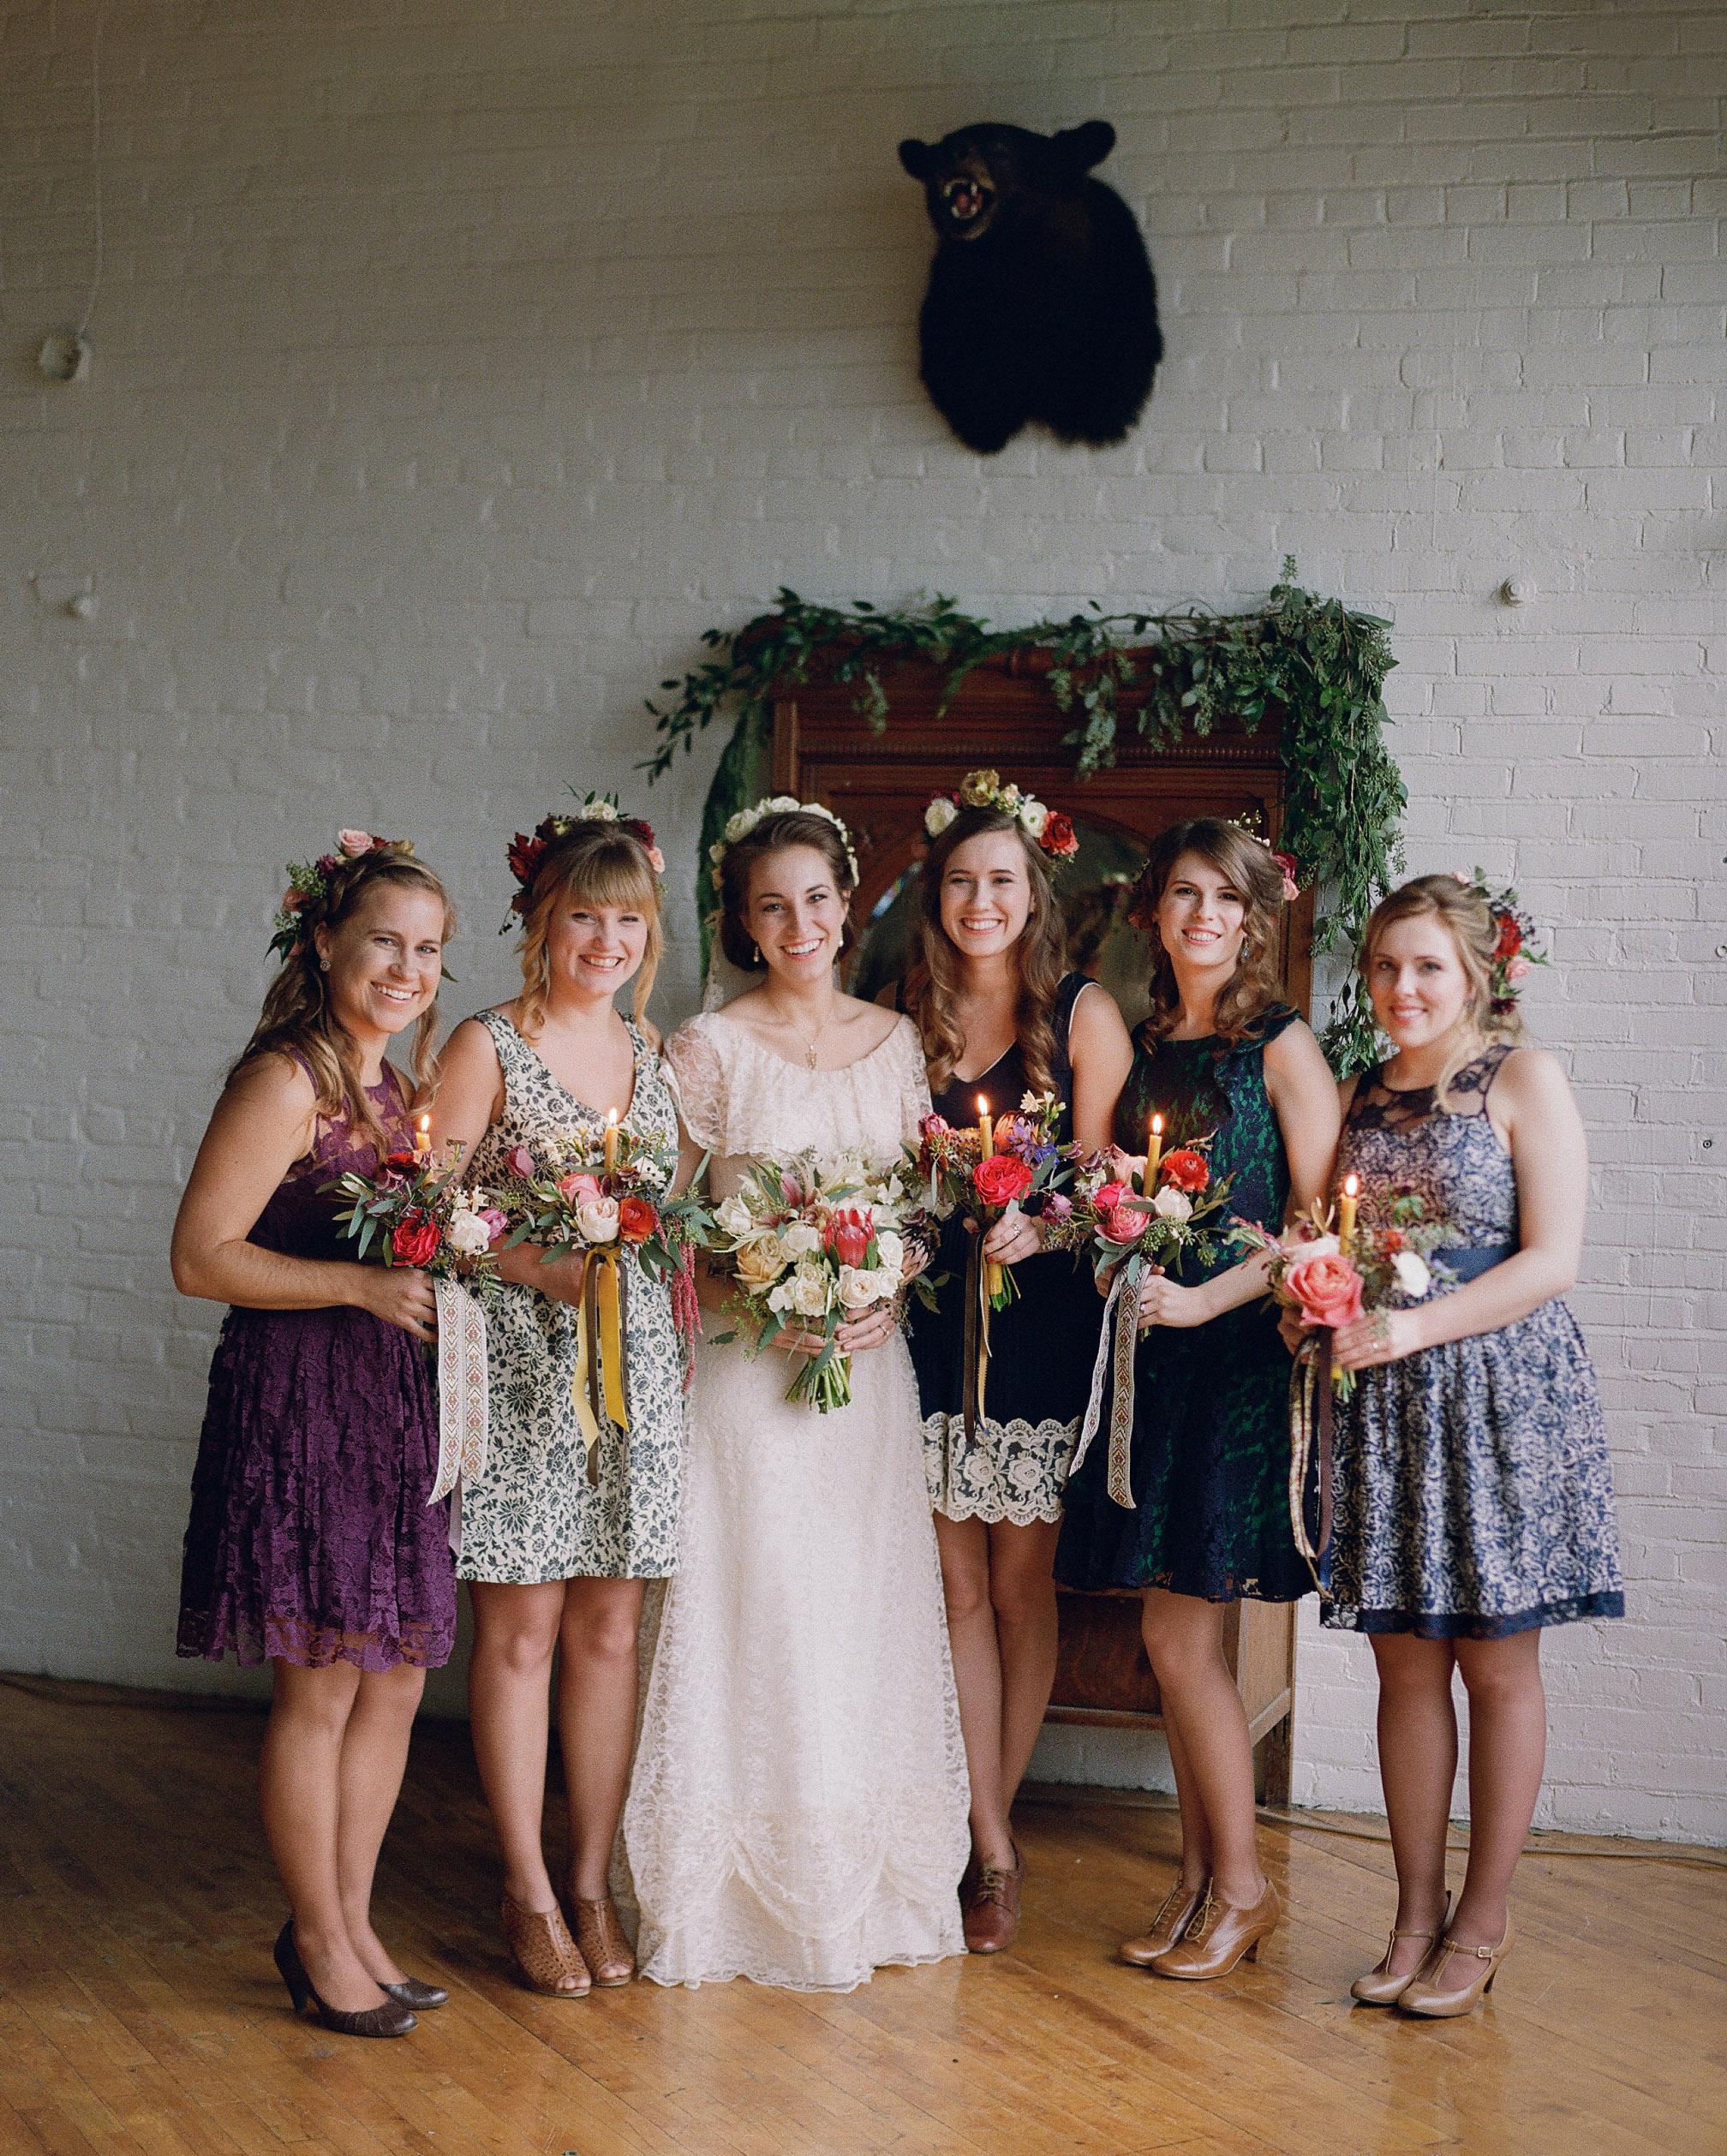 sidney-dane-wedding-bridesmaids-176-s112109-0815.jpg